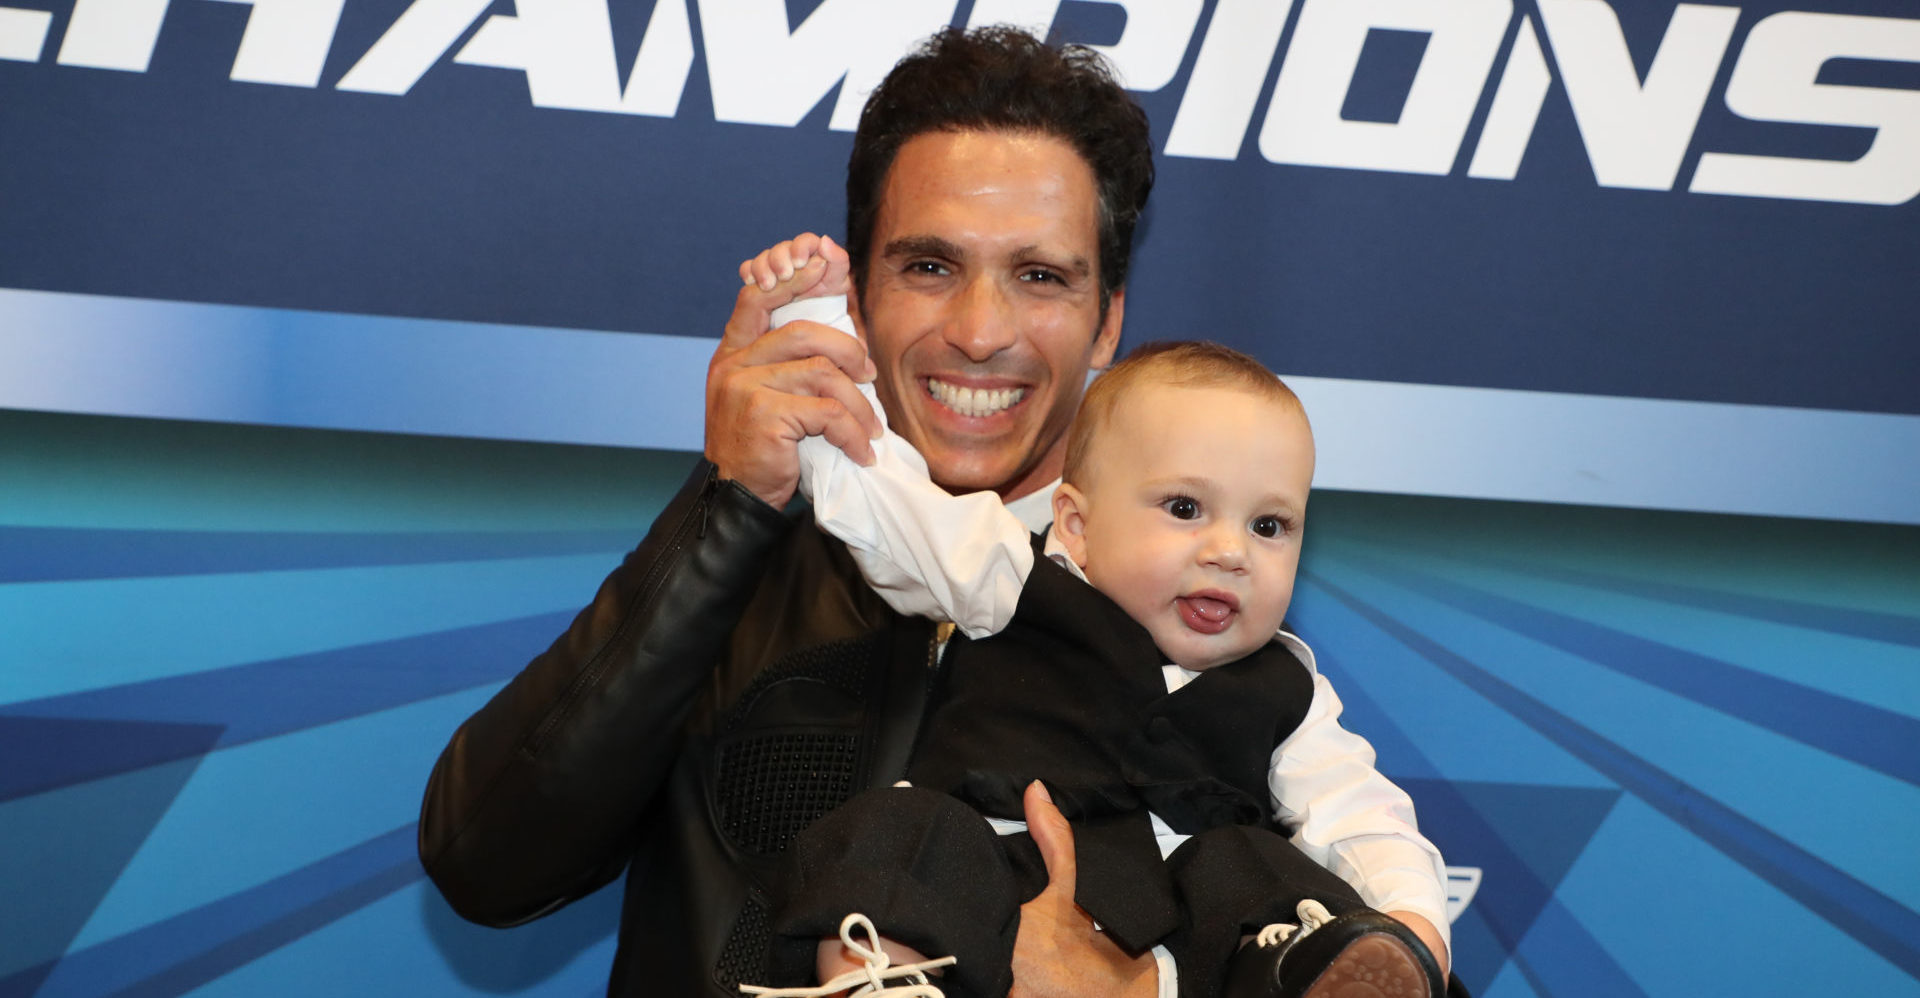 Toni Elias (shown with son Antoni) will join Team Hammer for the 2020 MotoAmerica Superbike Championship on an M4 ECSTAR Suzuki GSX-R1000. Photo by Brian J. Nelson, courtesy of Suzuki Motor of America, Inc.